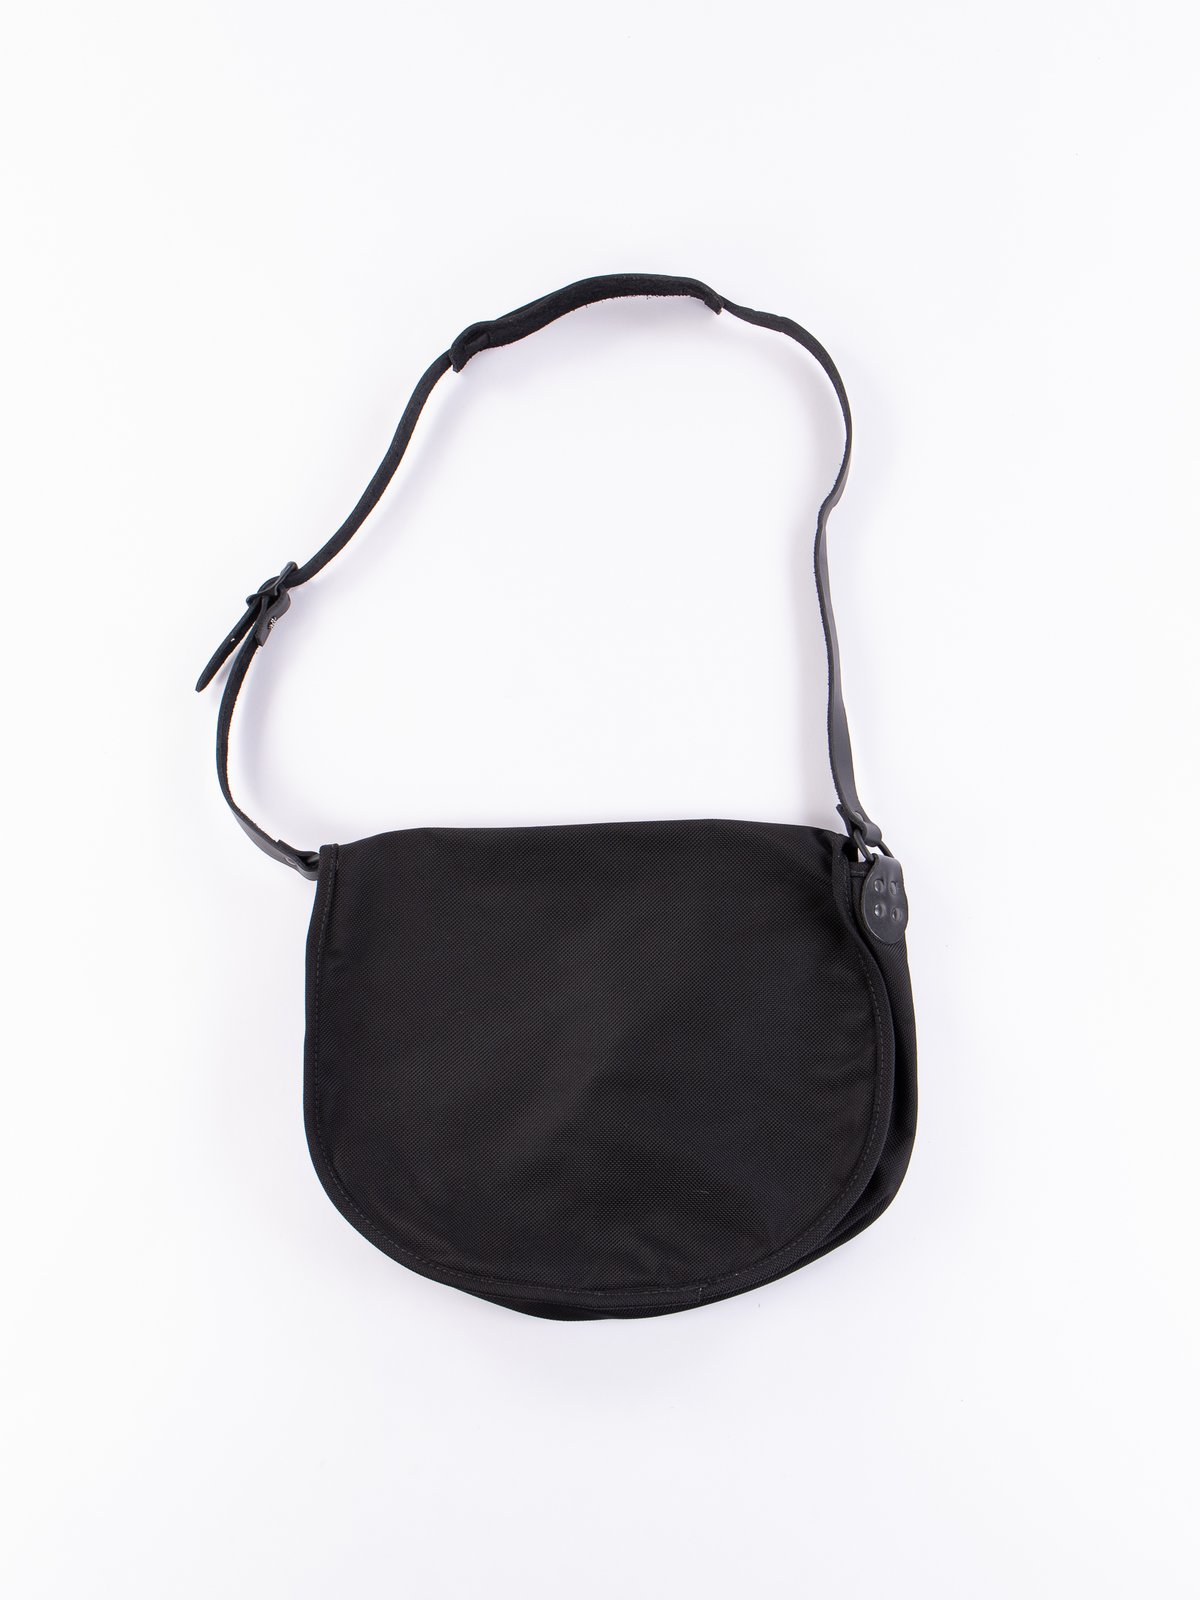 Black Large Ballistic Nylon Binocular Bag - Image 4